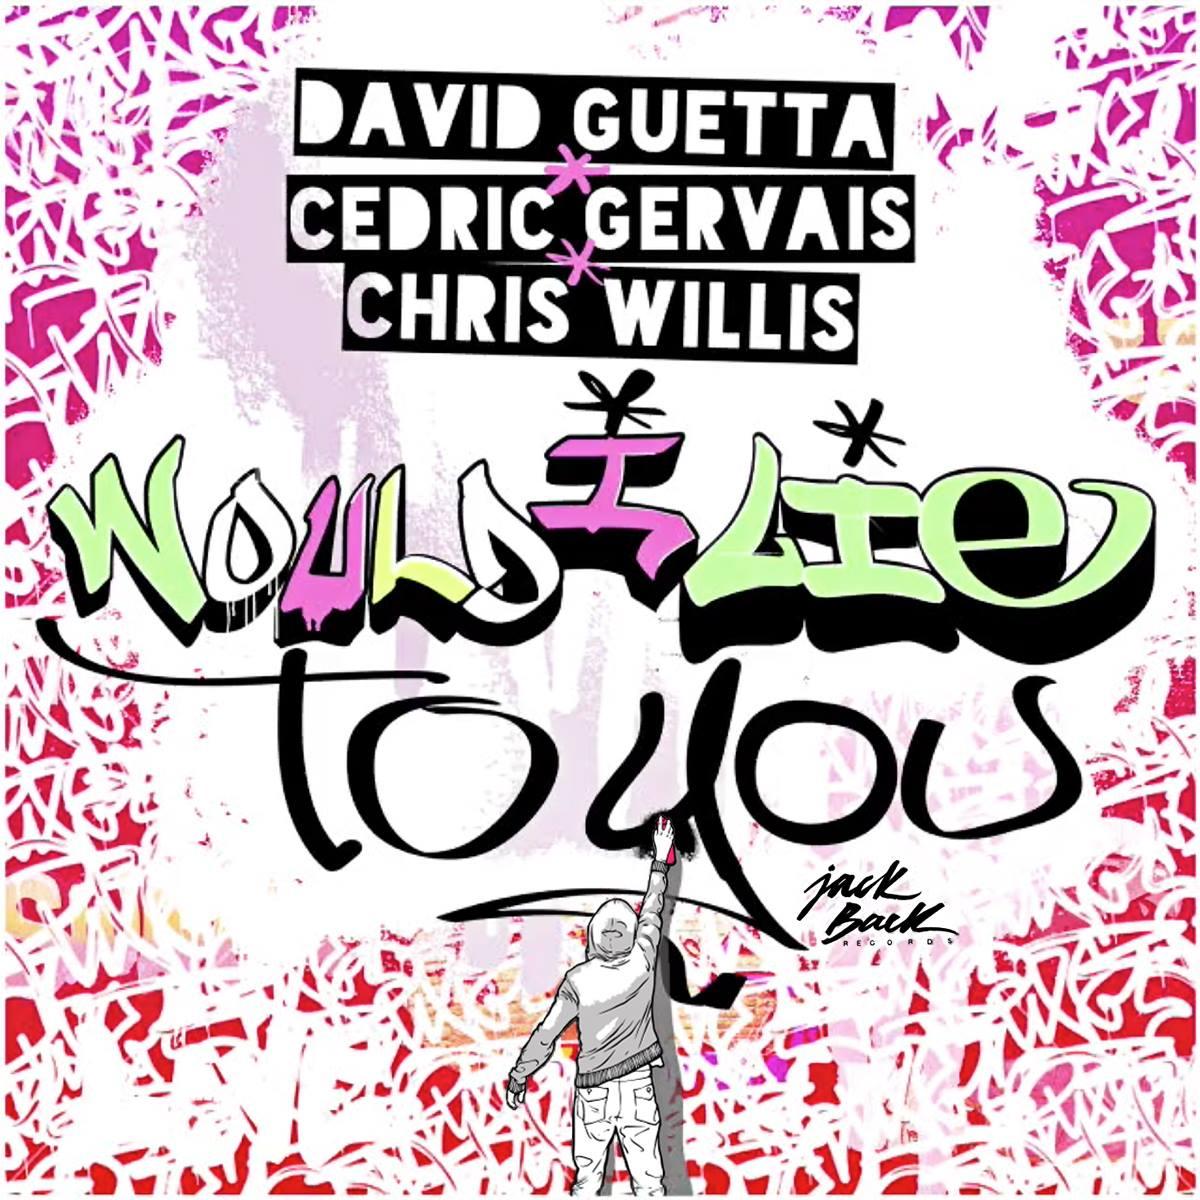 DAVID GUETTA & CEDRIC GERVAIS & CHRIS WILLIS - Would I Lie To You (Jack Back/Parlophone/Warner)